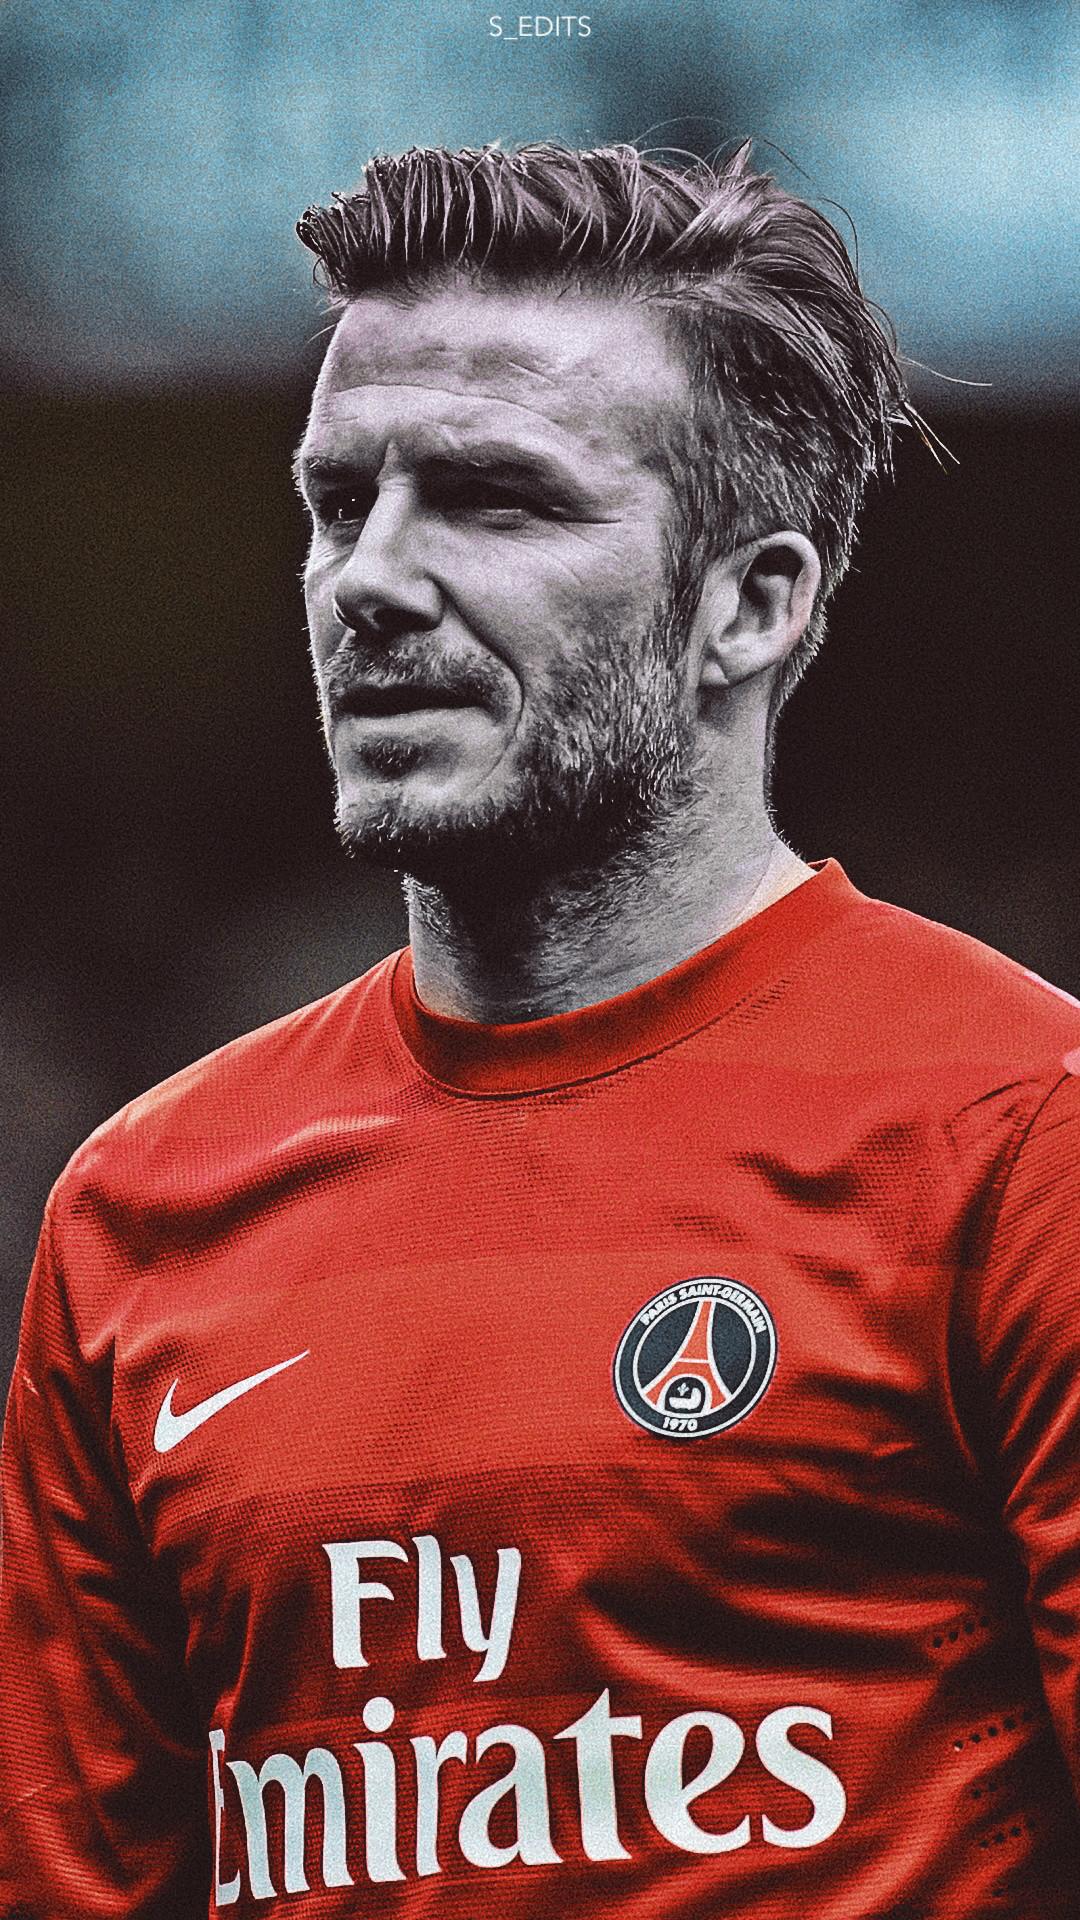 Res: 1080x1920, David Beckham phone wallpaper